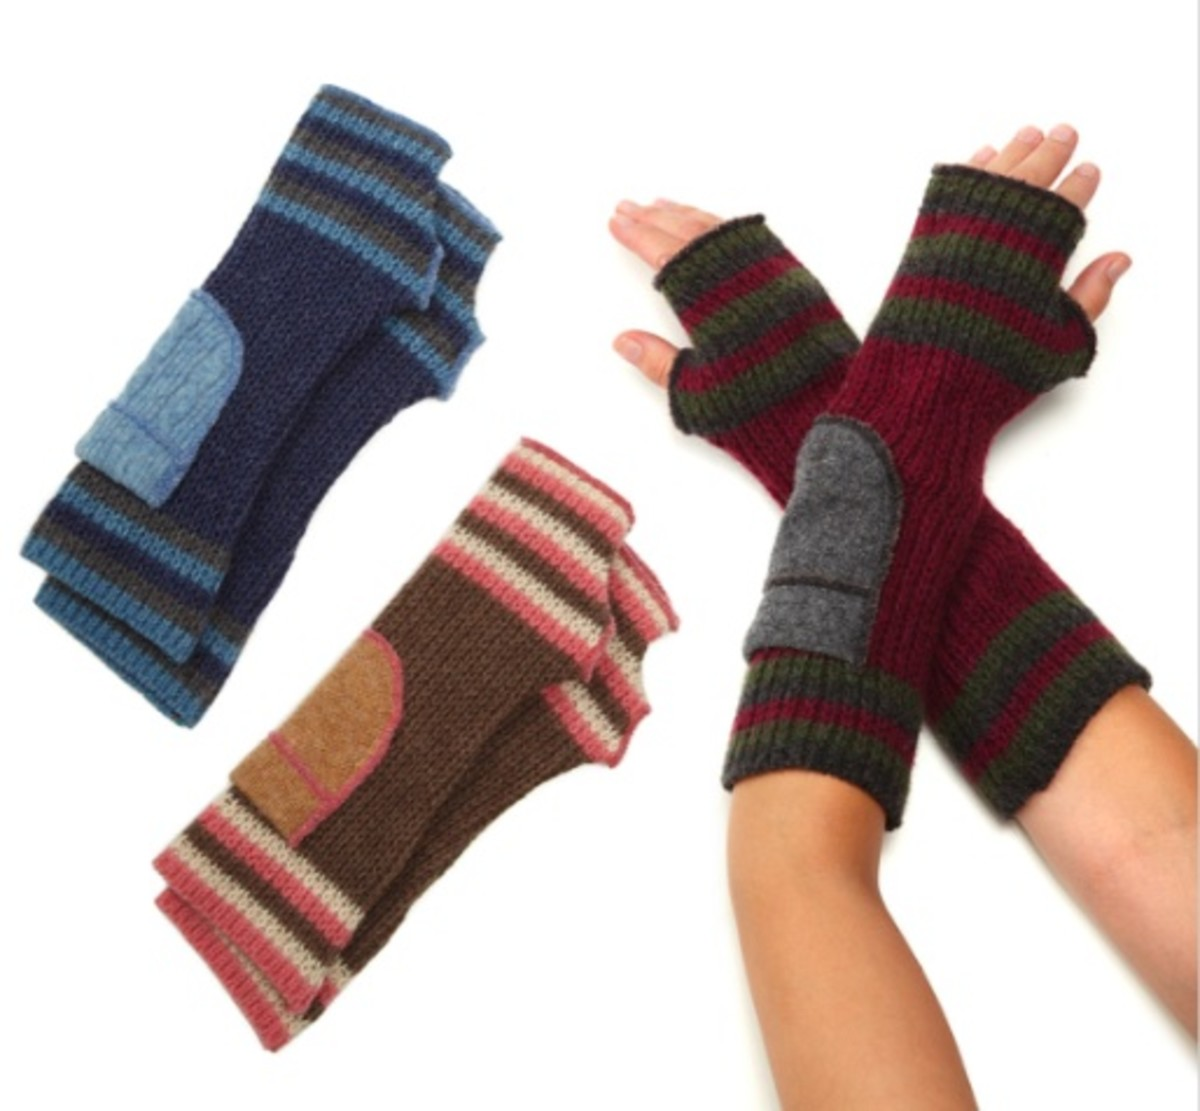 arm-warmers